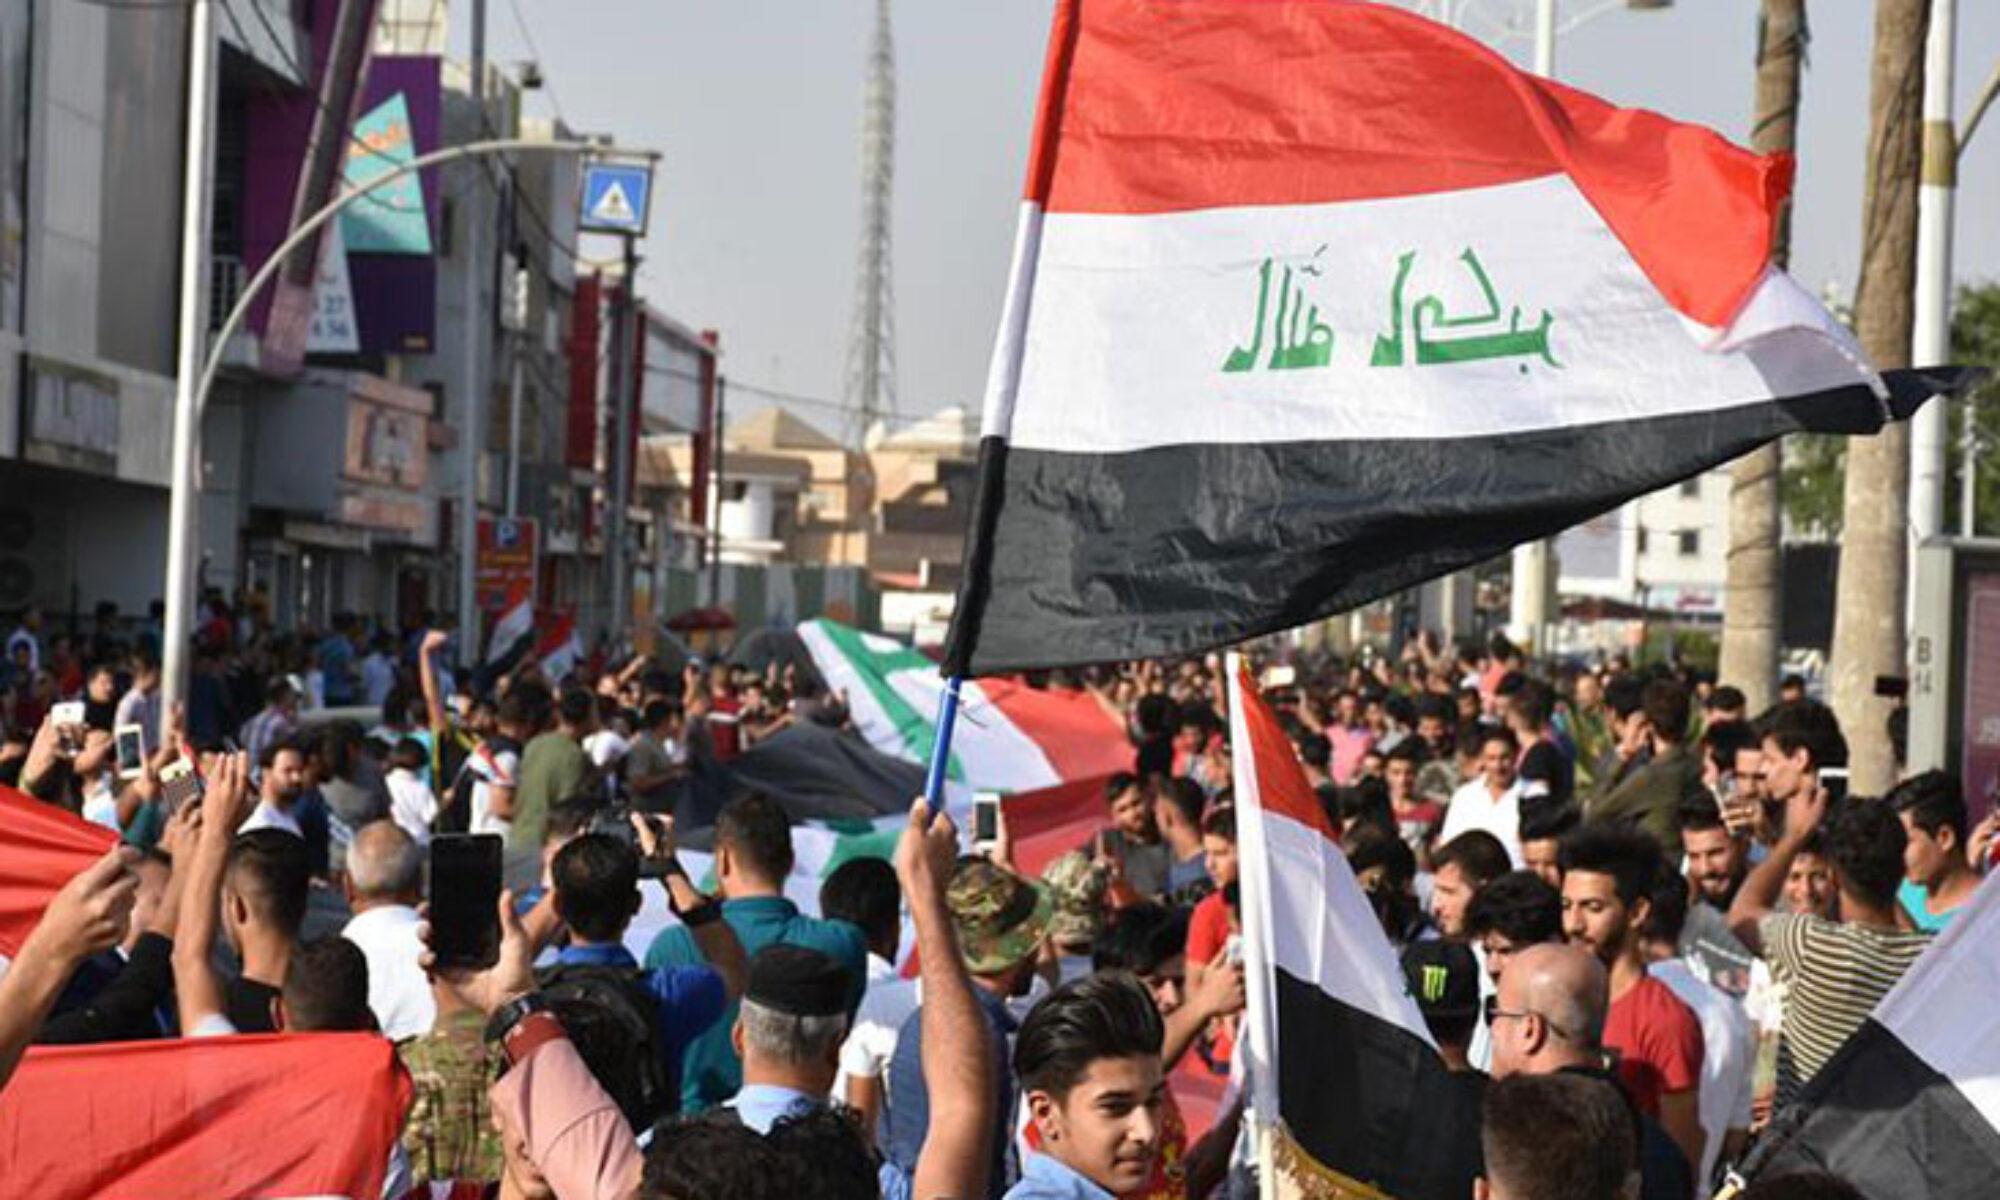 Irak'ta protestoculara ateş açıldı